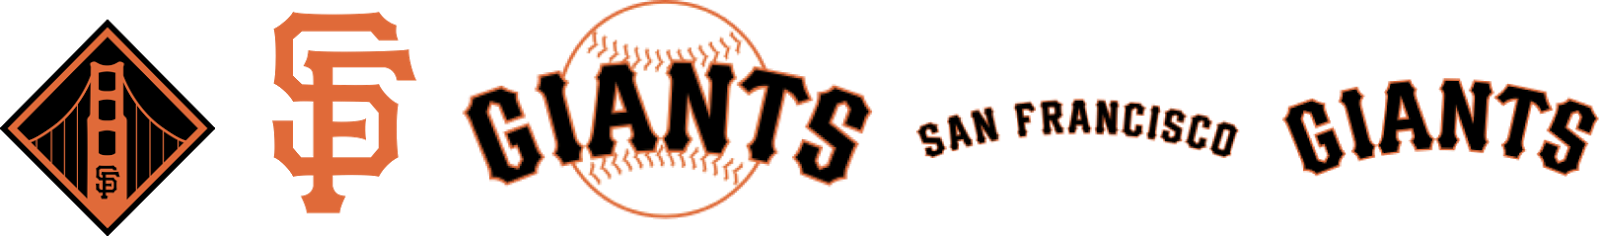 Lara Sports Design Mlb 2019 San Francisco Giants